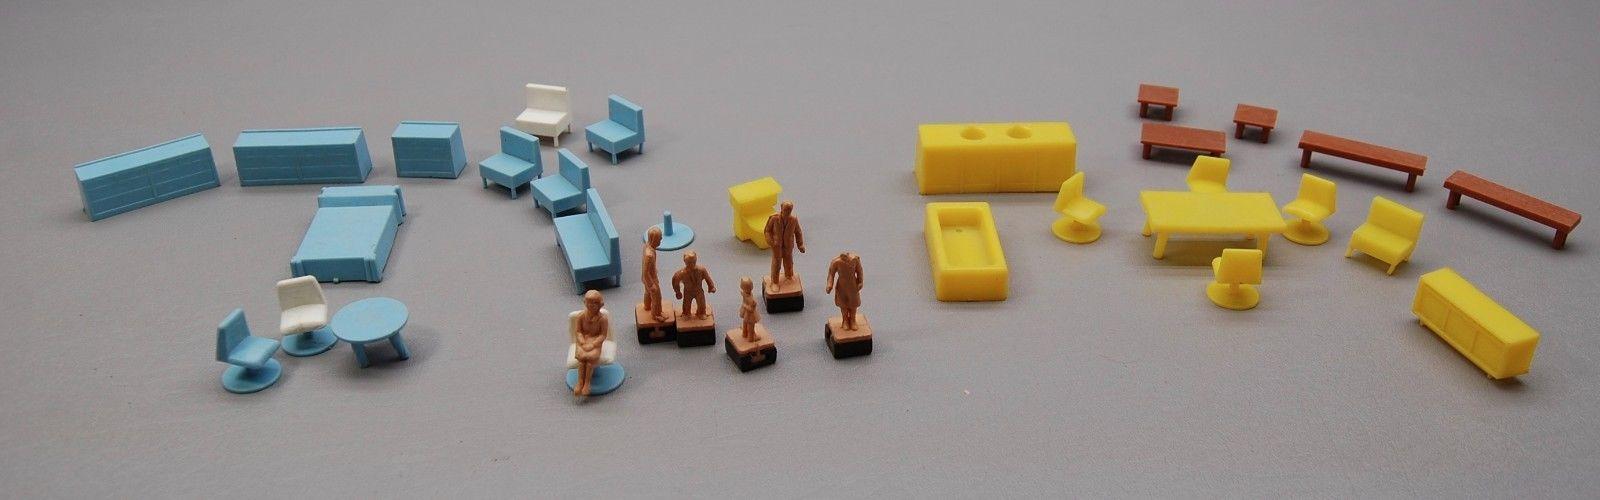 Vintage Marx? Plastic dollhouse Furniture 1960s miniature people w/ magnets LOT